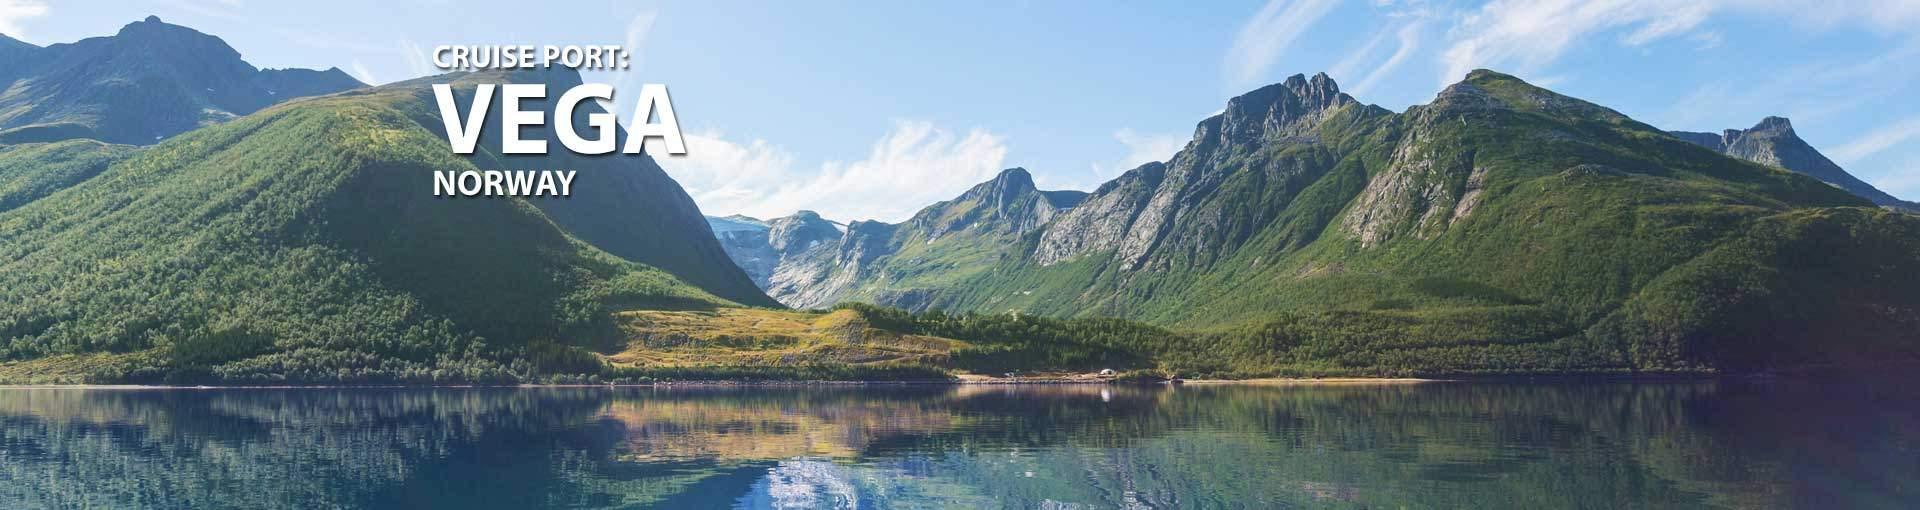 Cruises to Vega, Norway